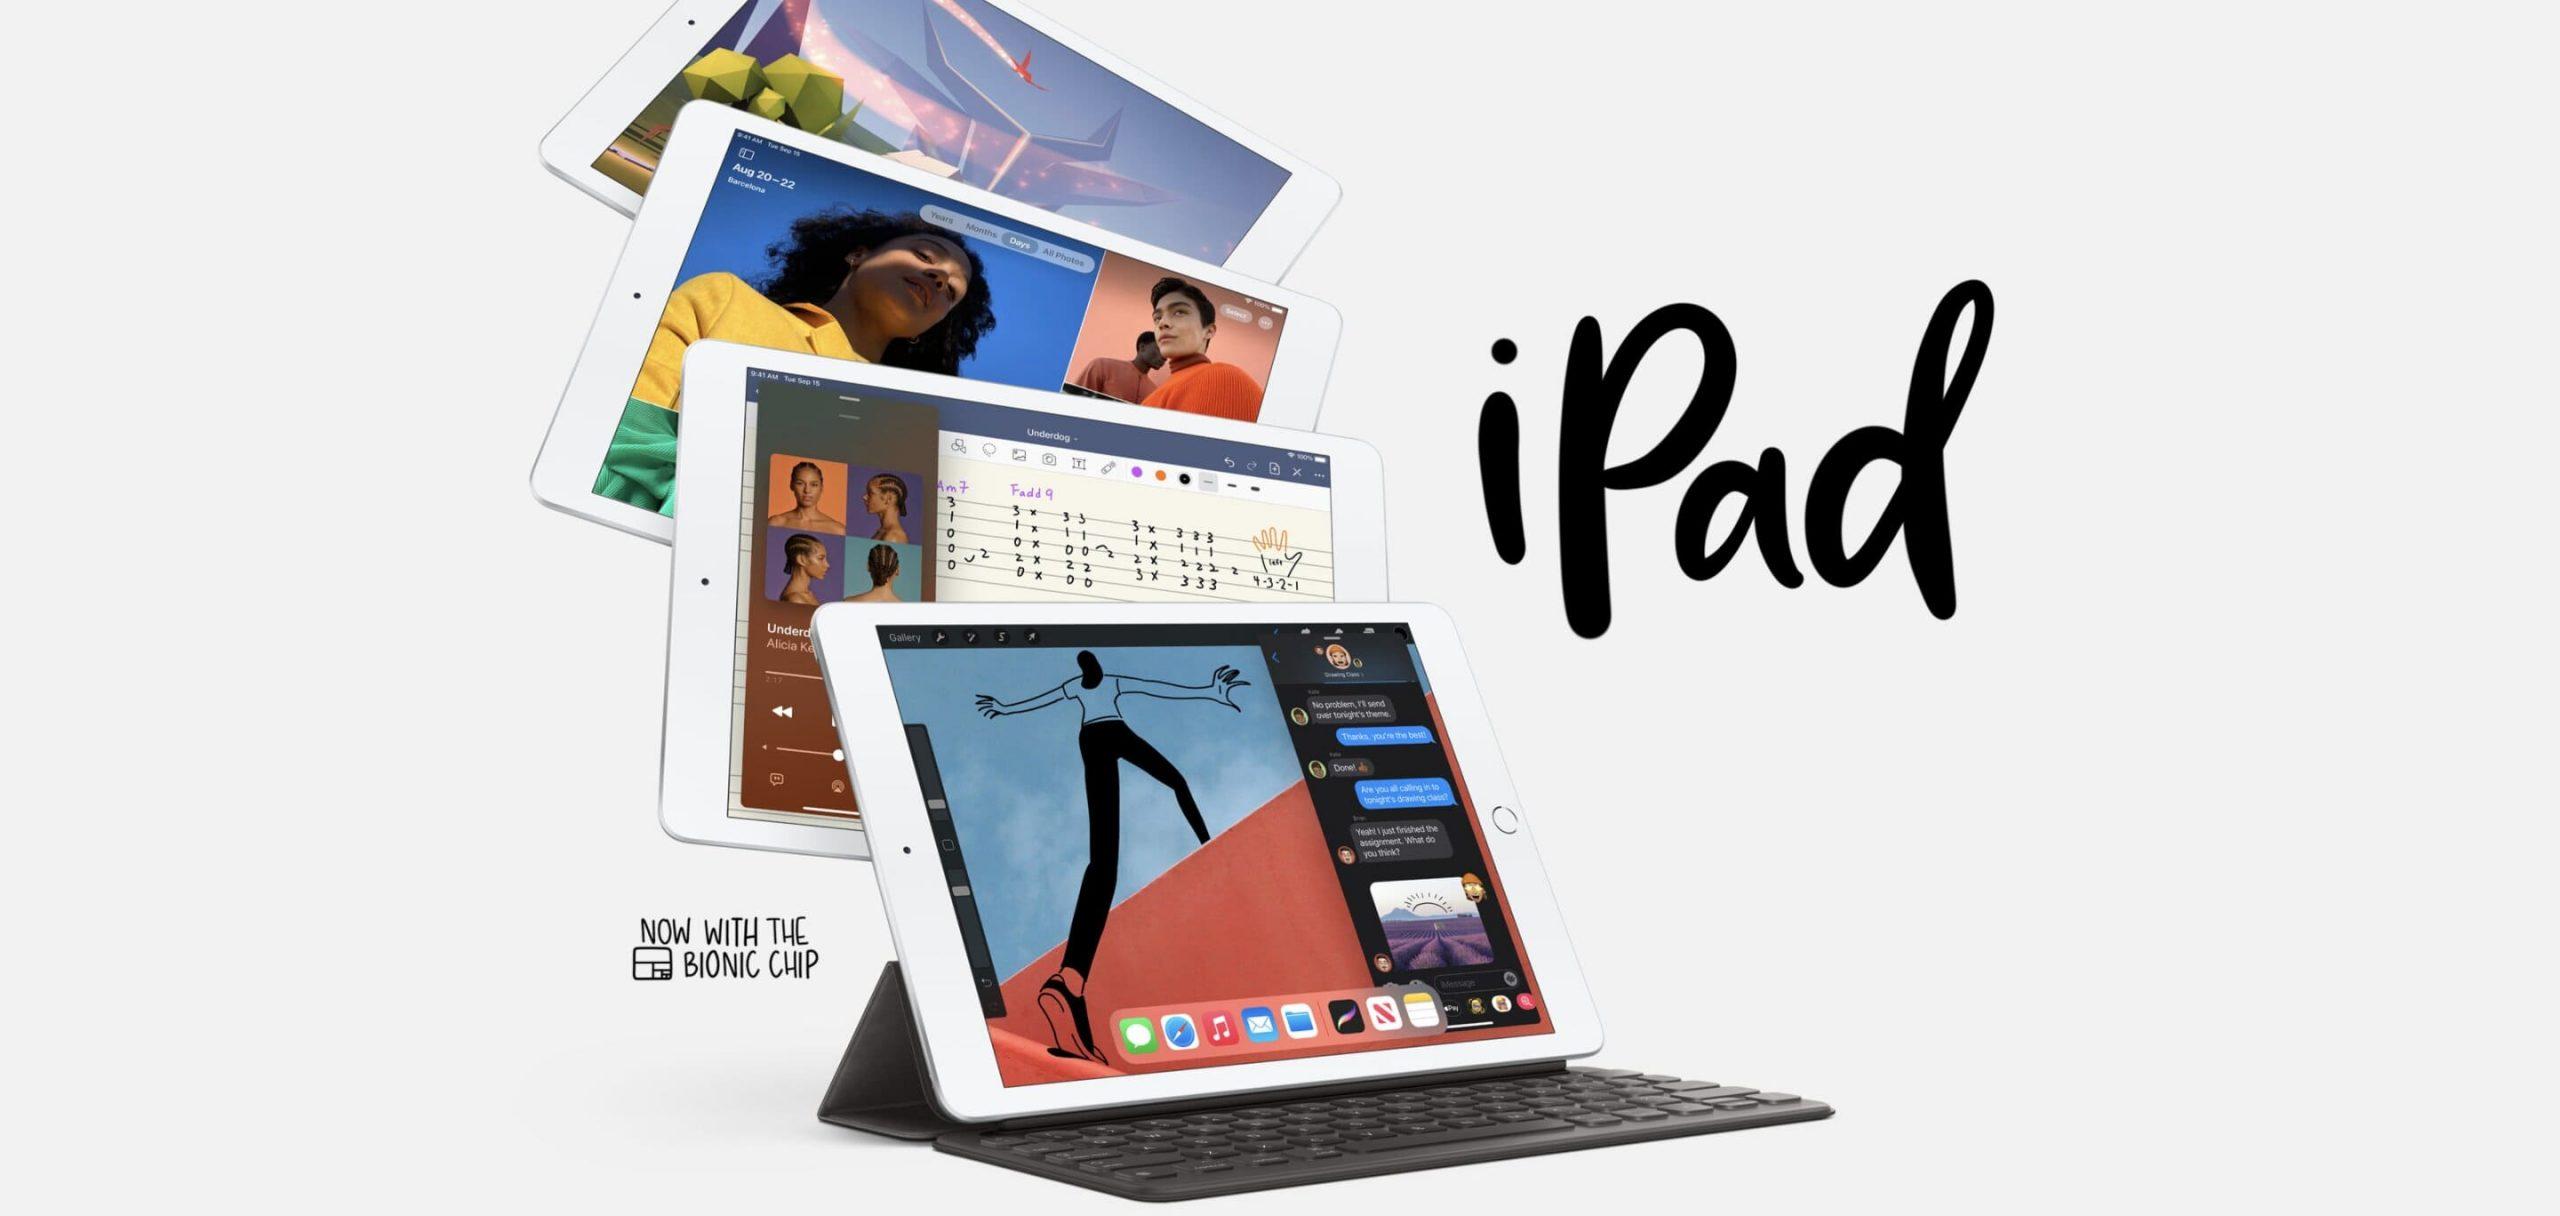 10.2-inch iPad 8th